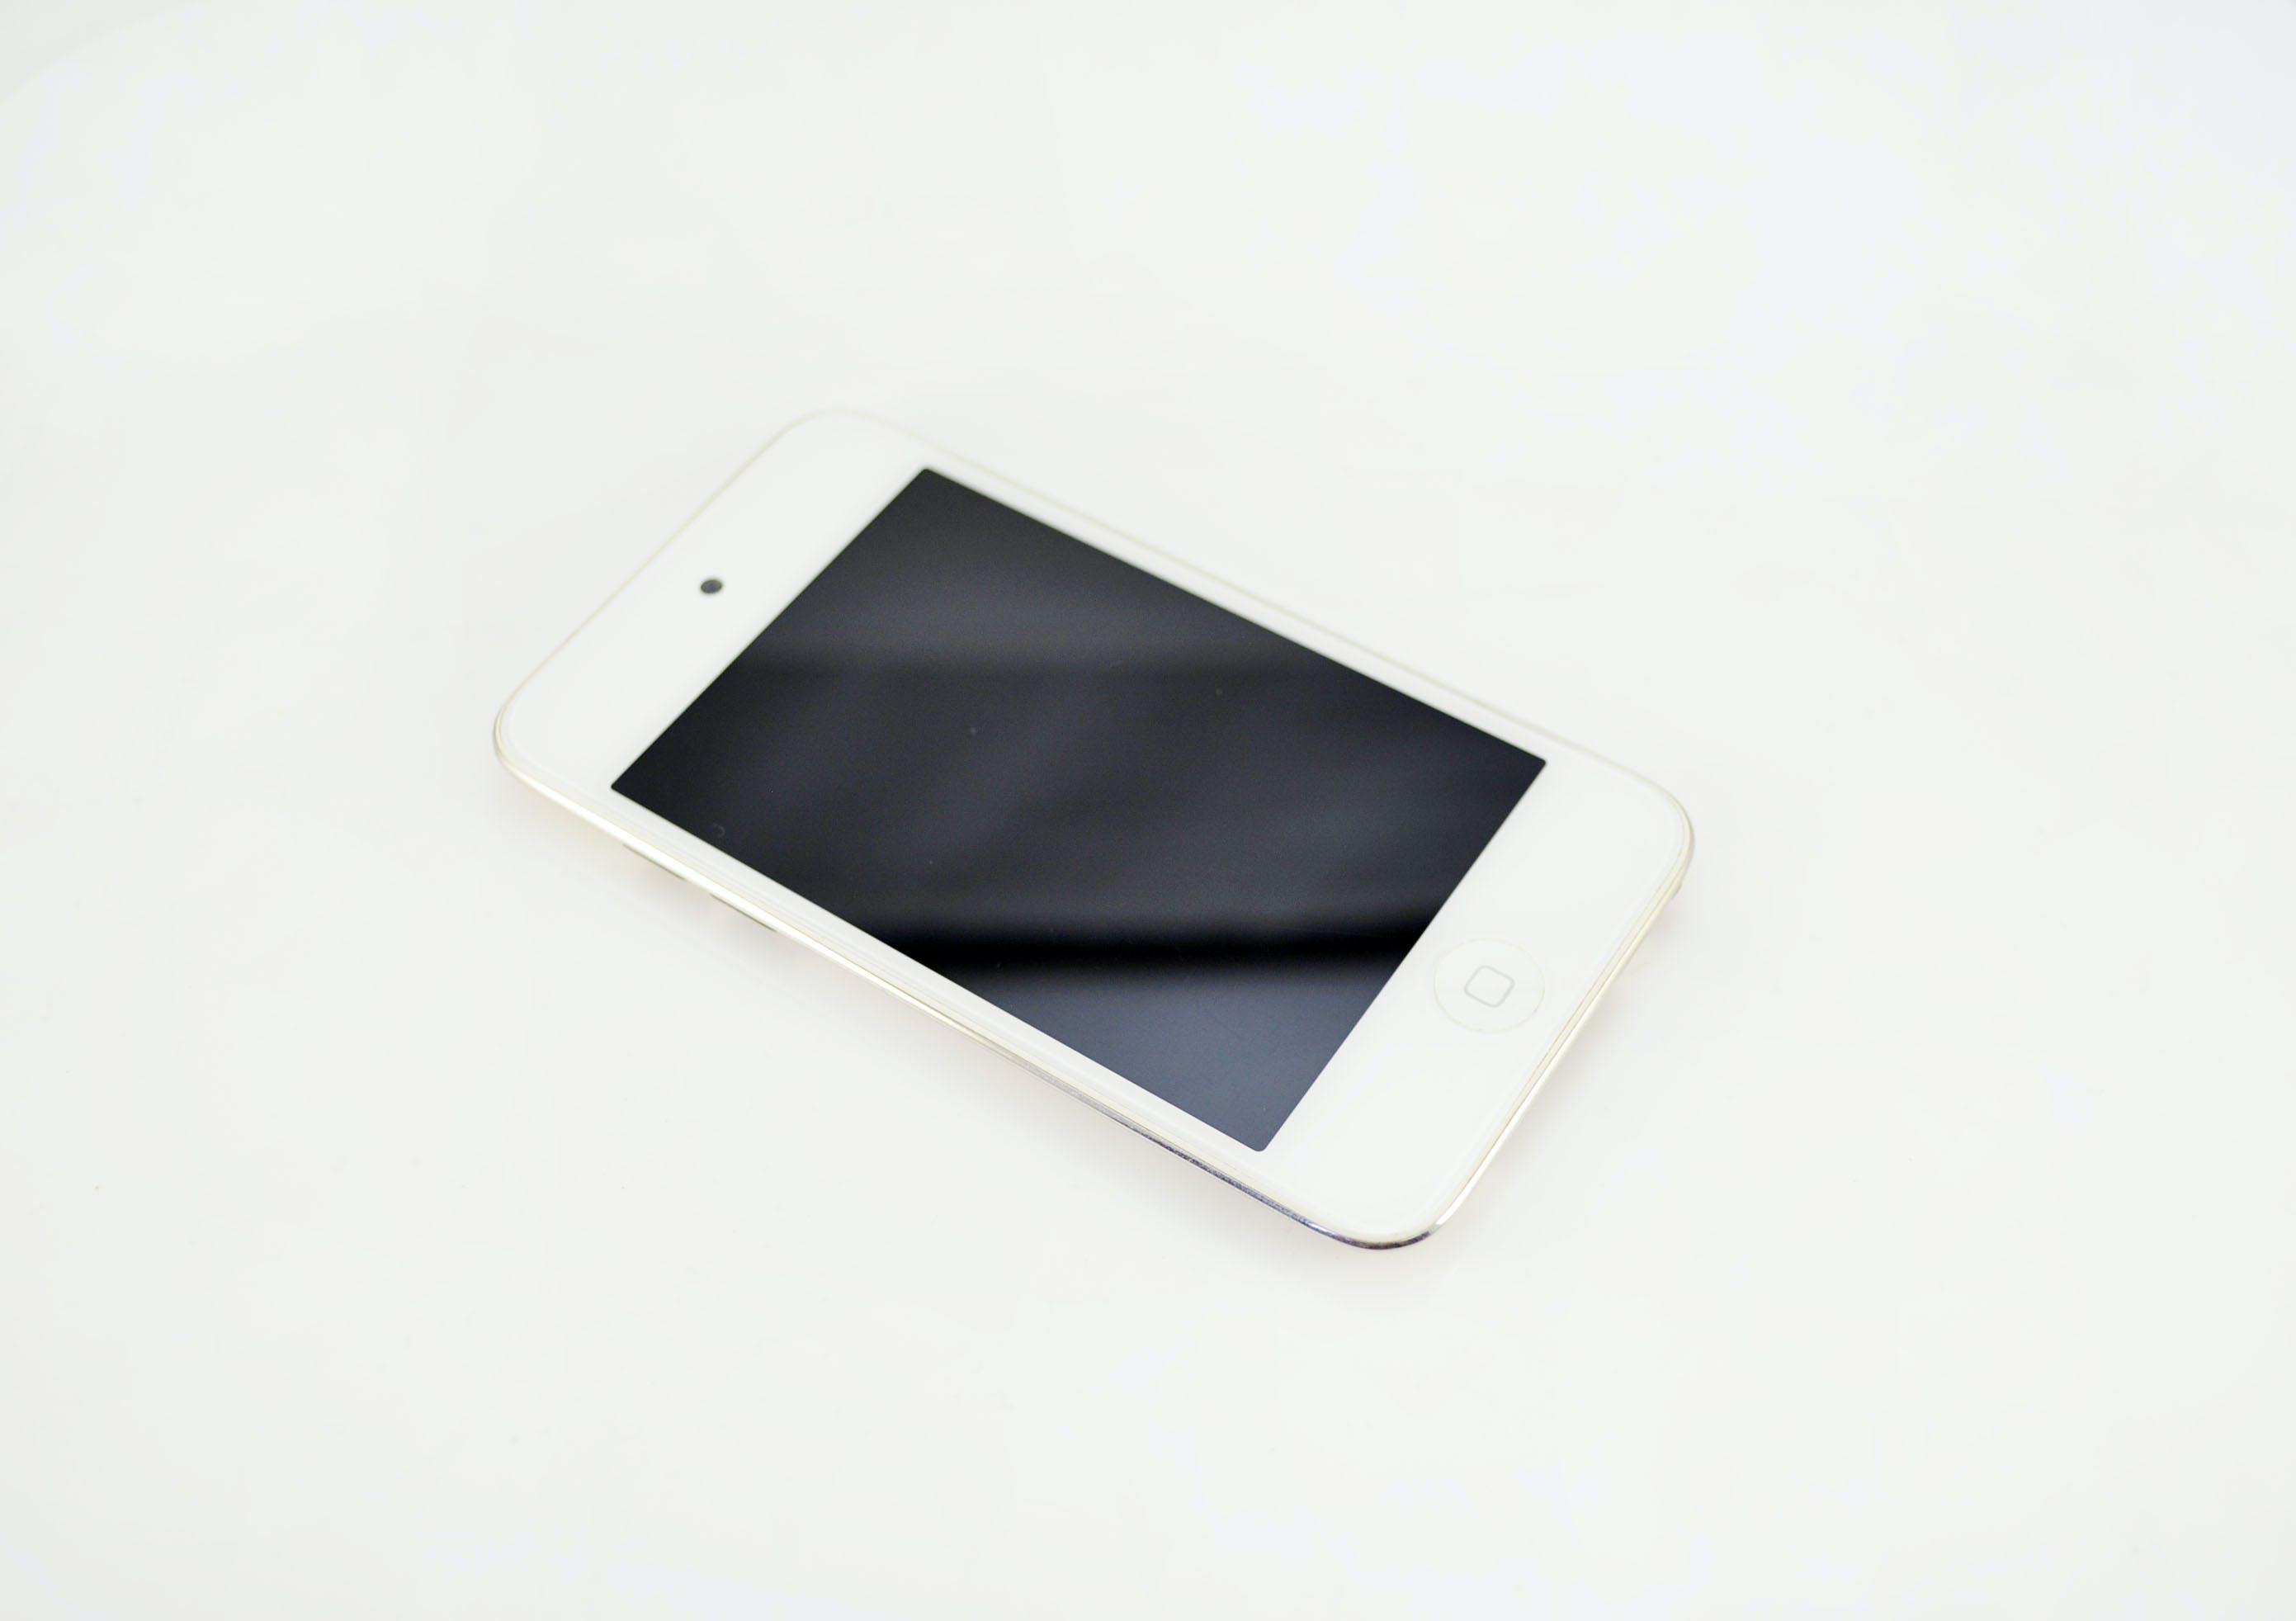 Gratis lagerfoto af Apple, hvid baggrund, hvid iphone, iPhone